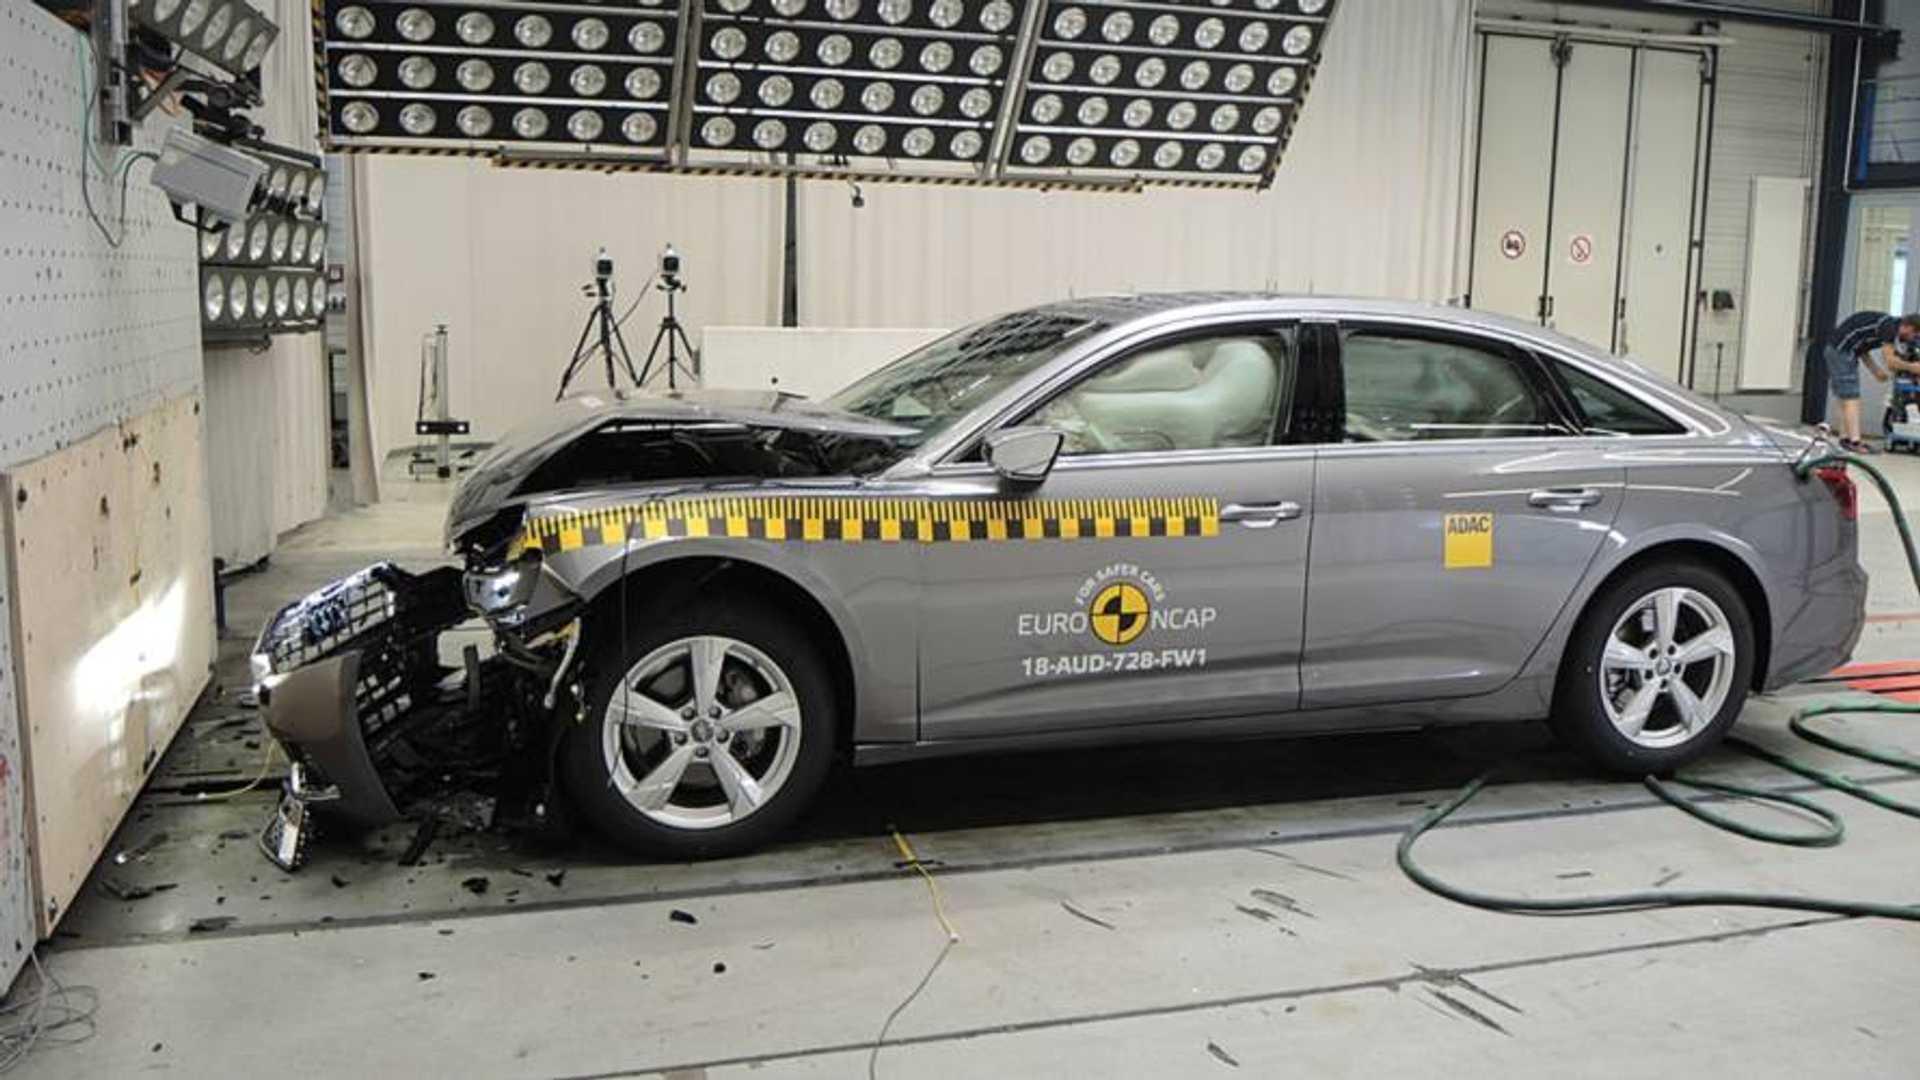 2019-audi-a6-euro-ncap-crash-test.jpg